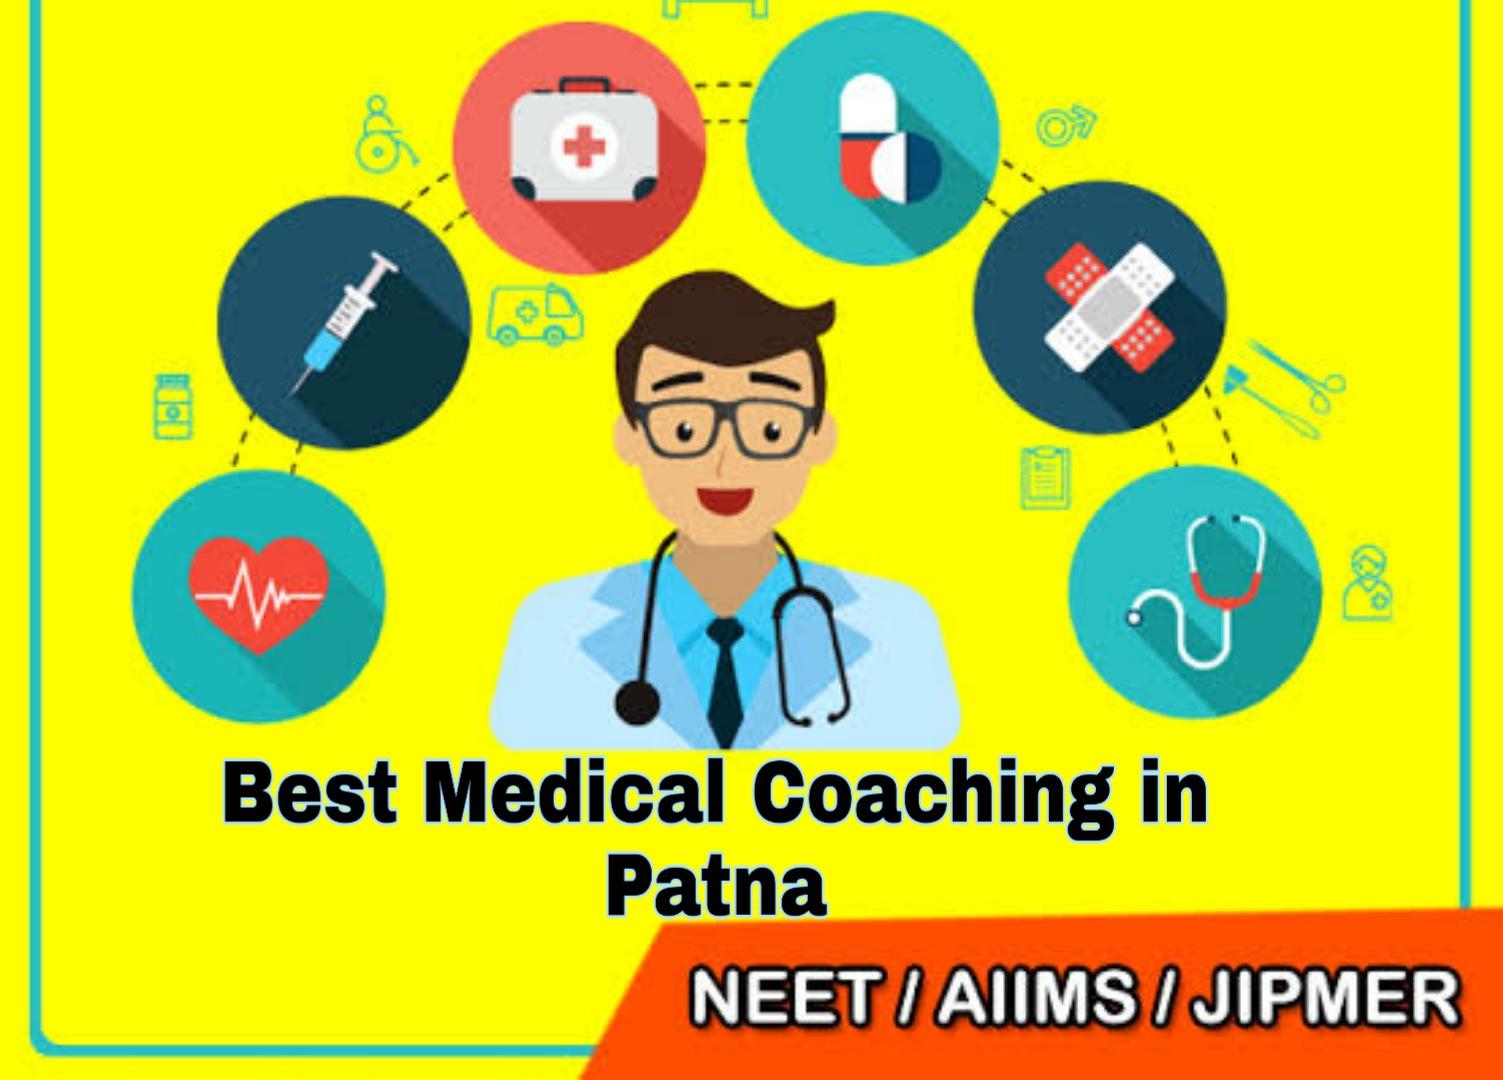 Best Medical Coaching in Patna